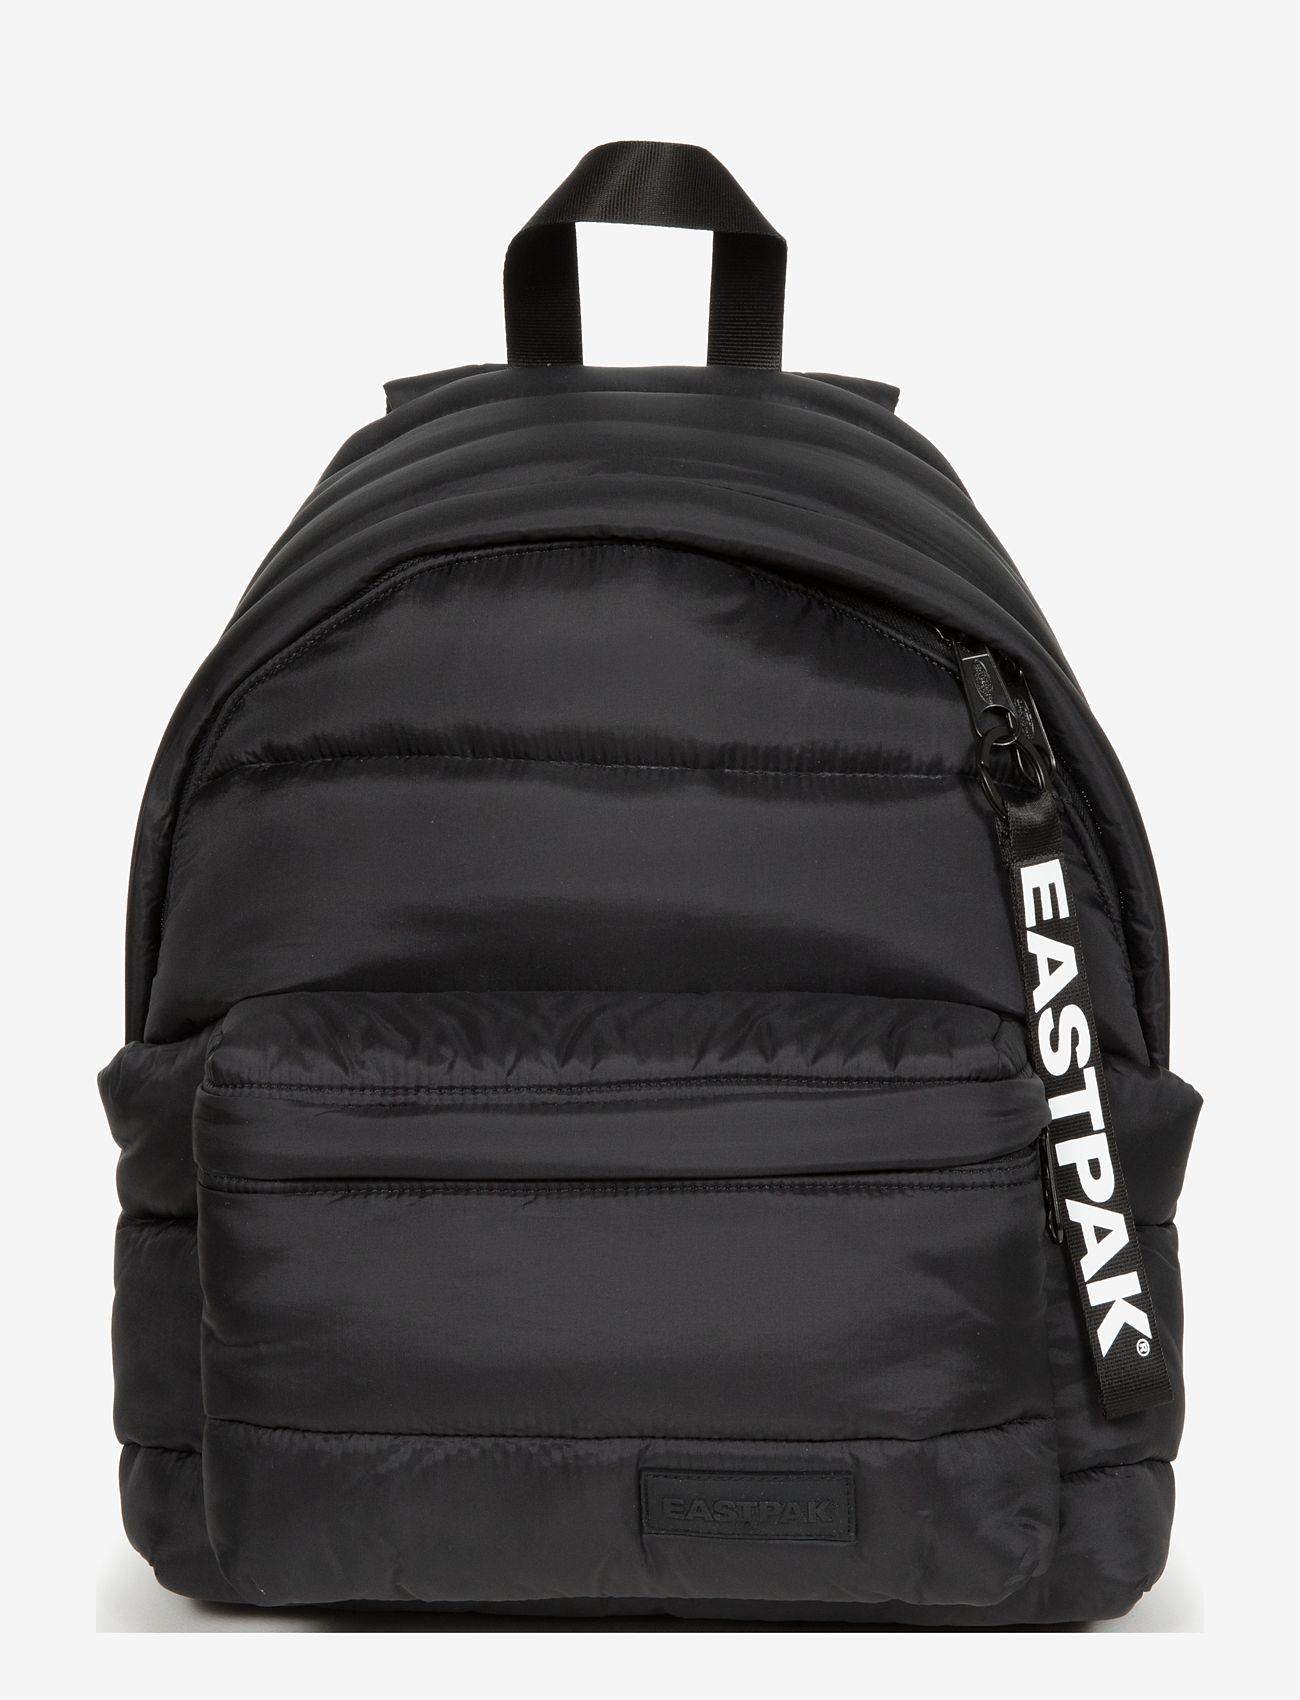 Eastpak - PADDED PAK'R - plecaki - puffed black - 0